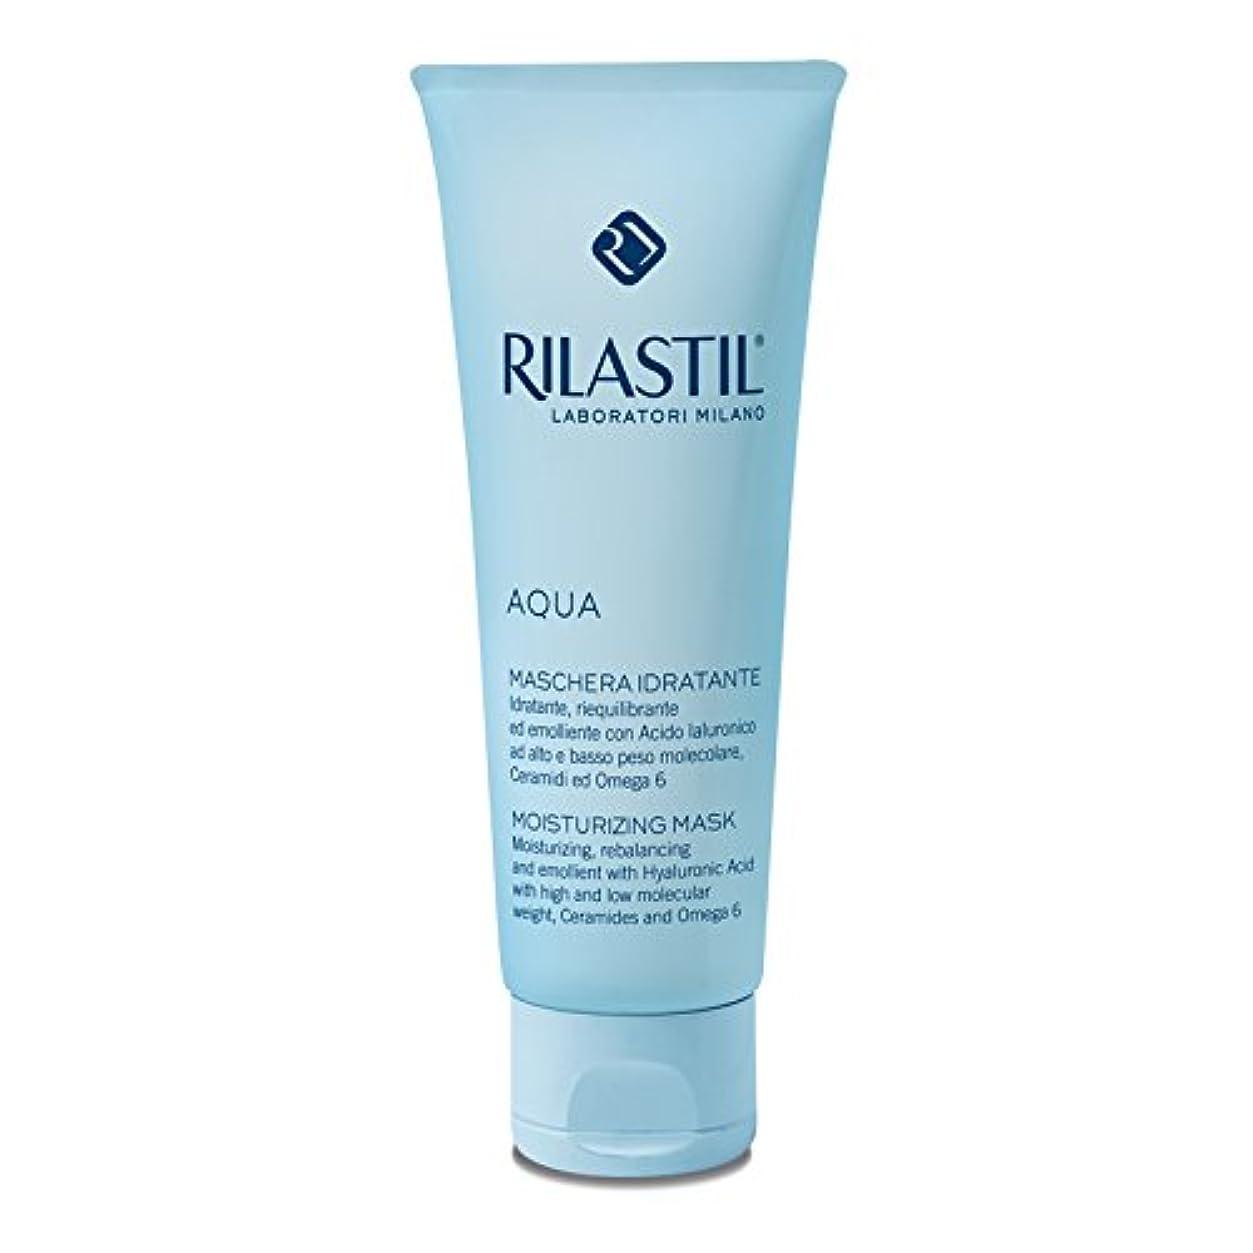 Rilastil - AQUA Moisturizing Mask (75 ml) [並行輸入品]